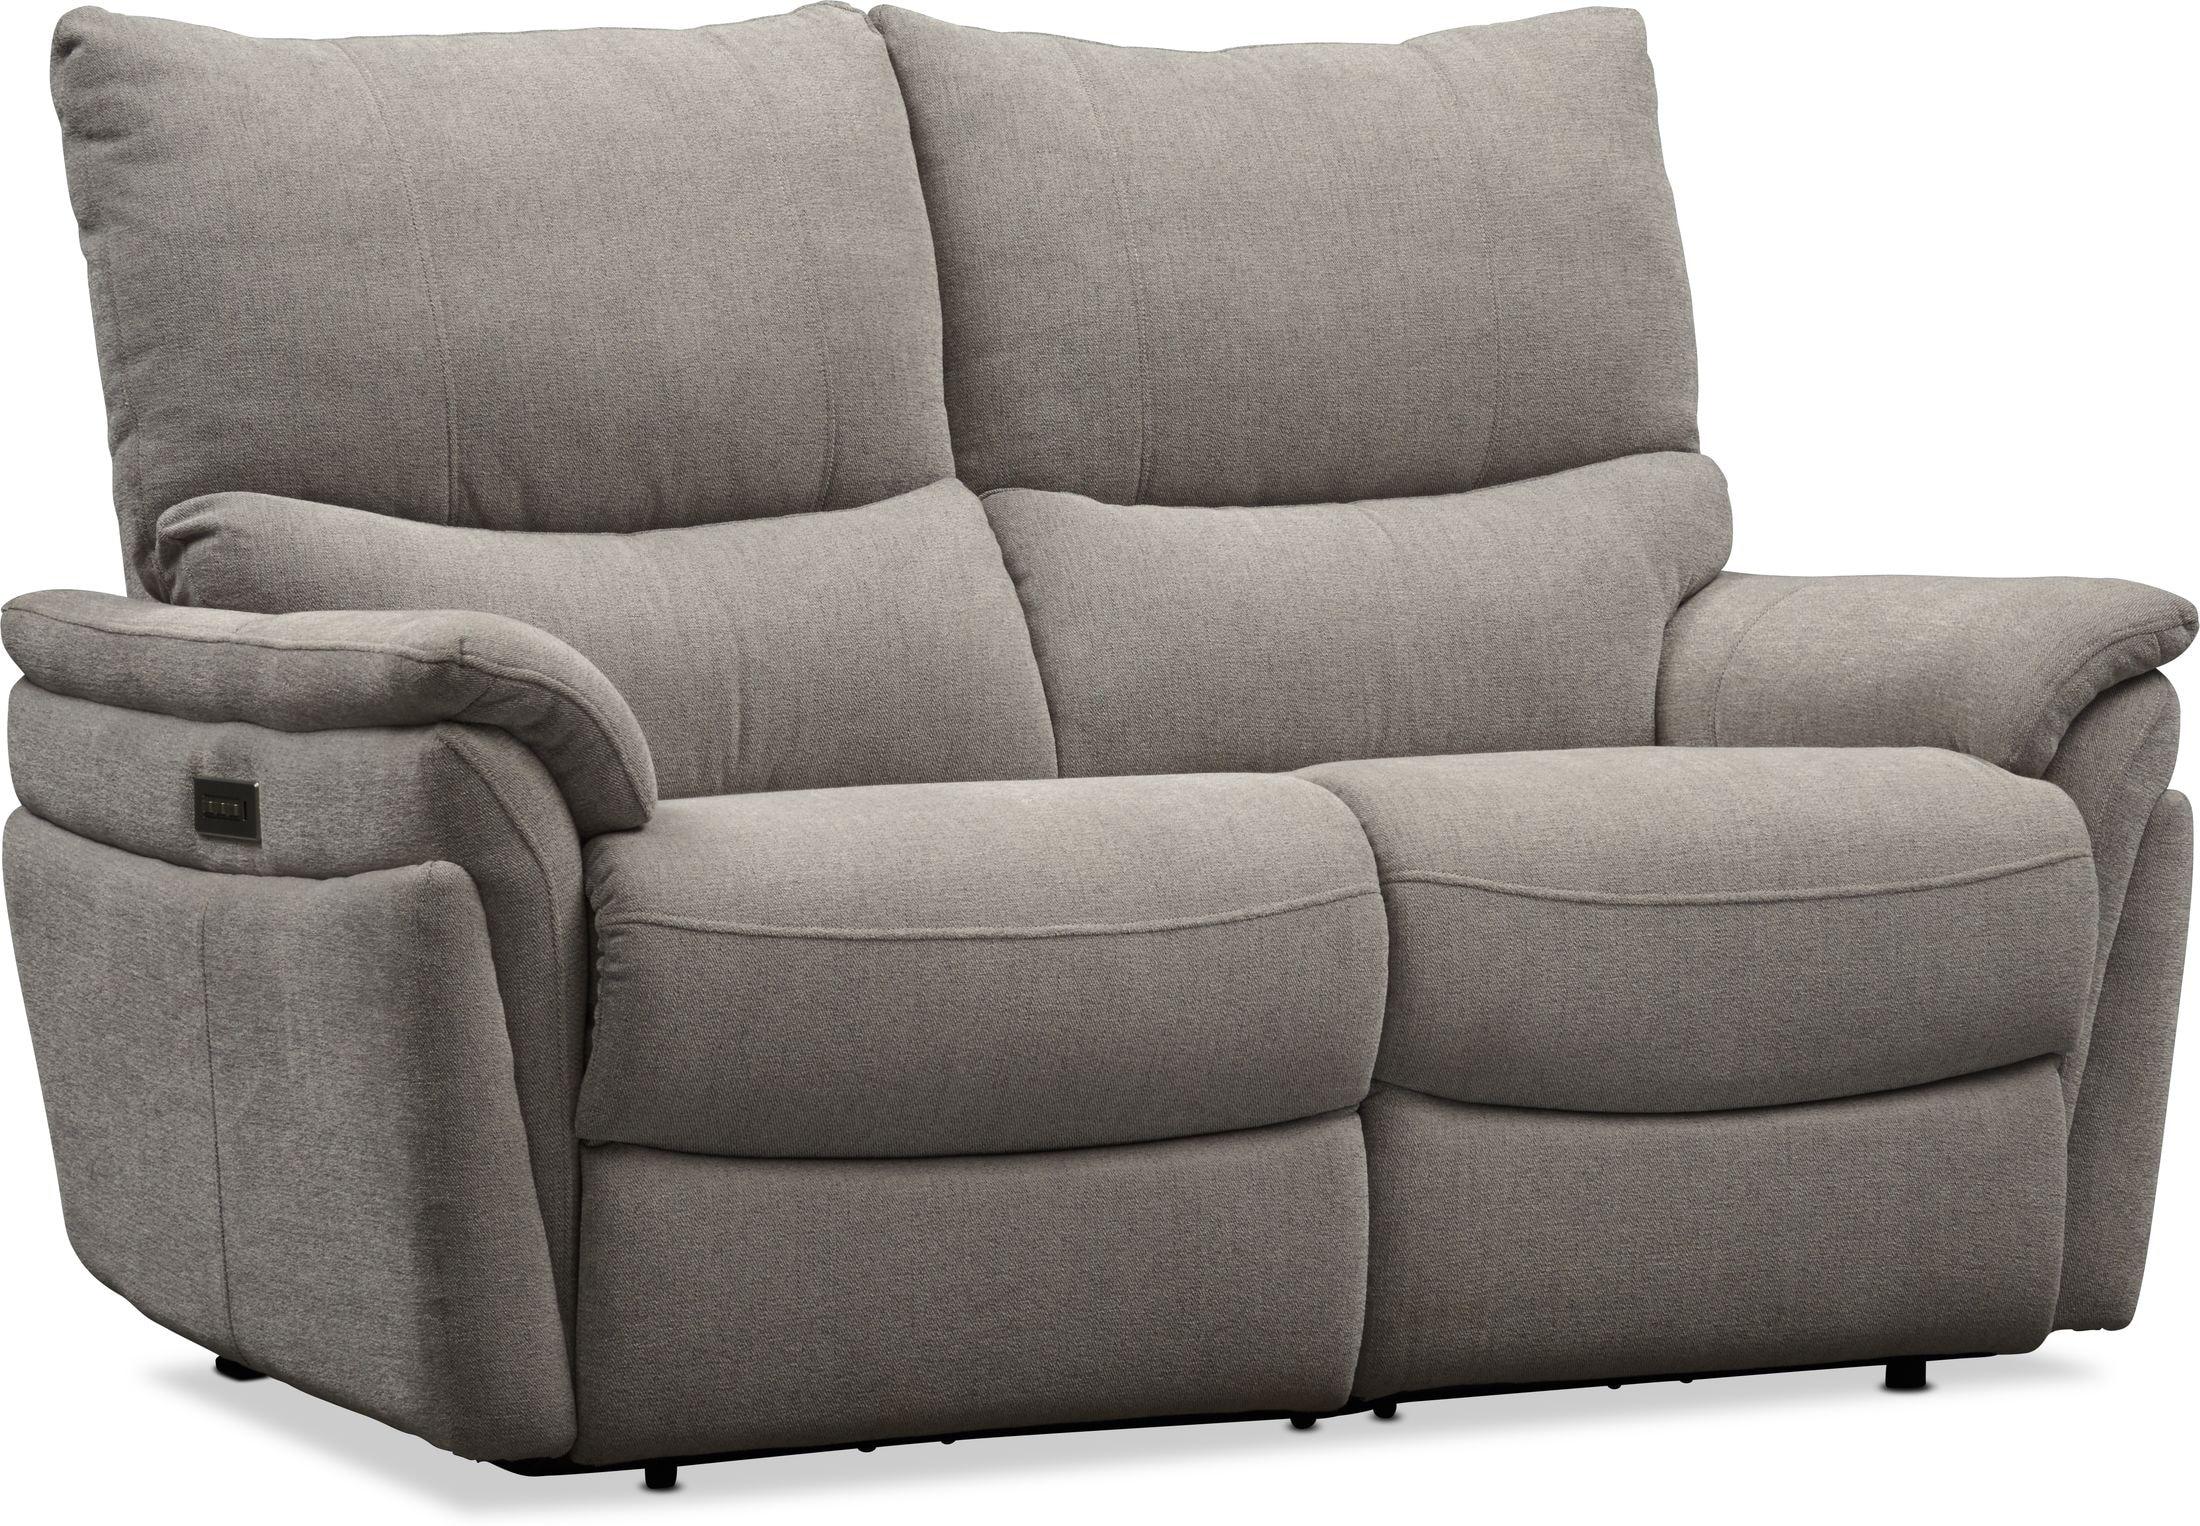 Living Room Furniture - Maddox Triple-Power Reclining Loveseat